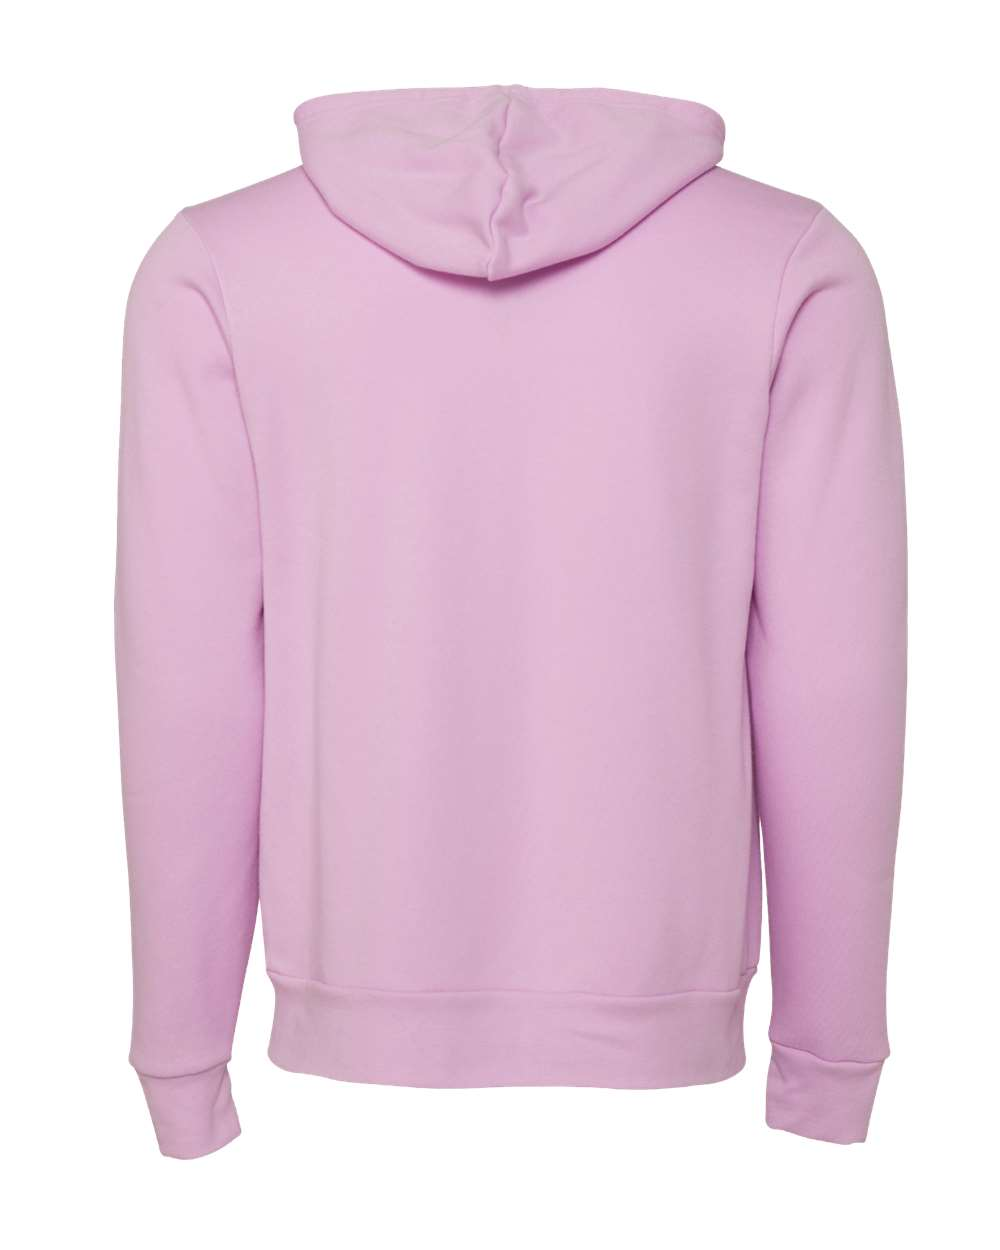 Bella-Canvas-Unisex-Full-Zip-Up-Hooded-Sweatshirt-Blank-Hoodie-3739-up-to-3XL thumbnail 63